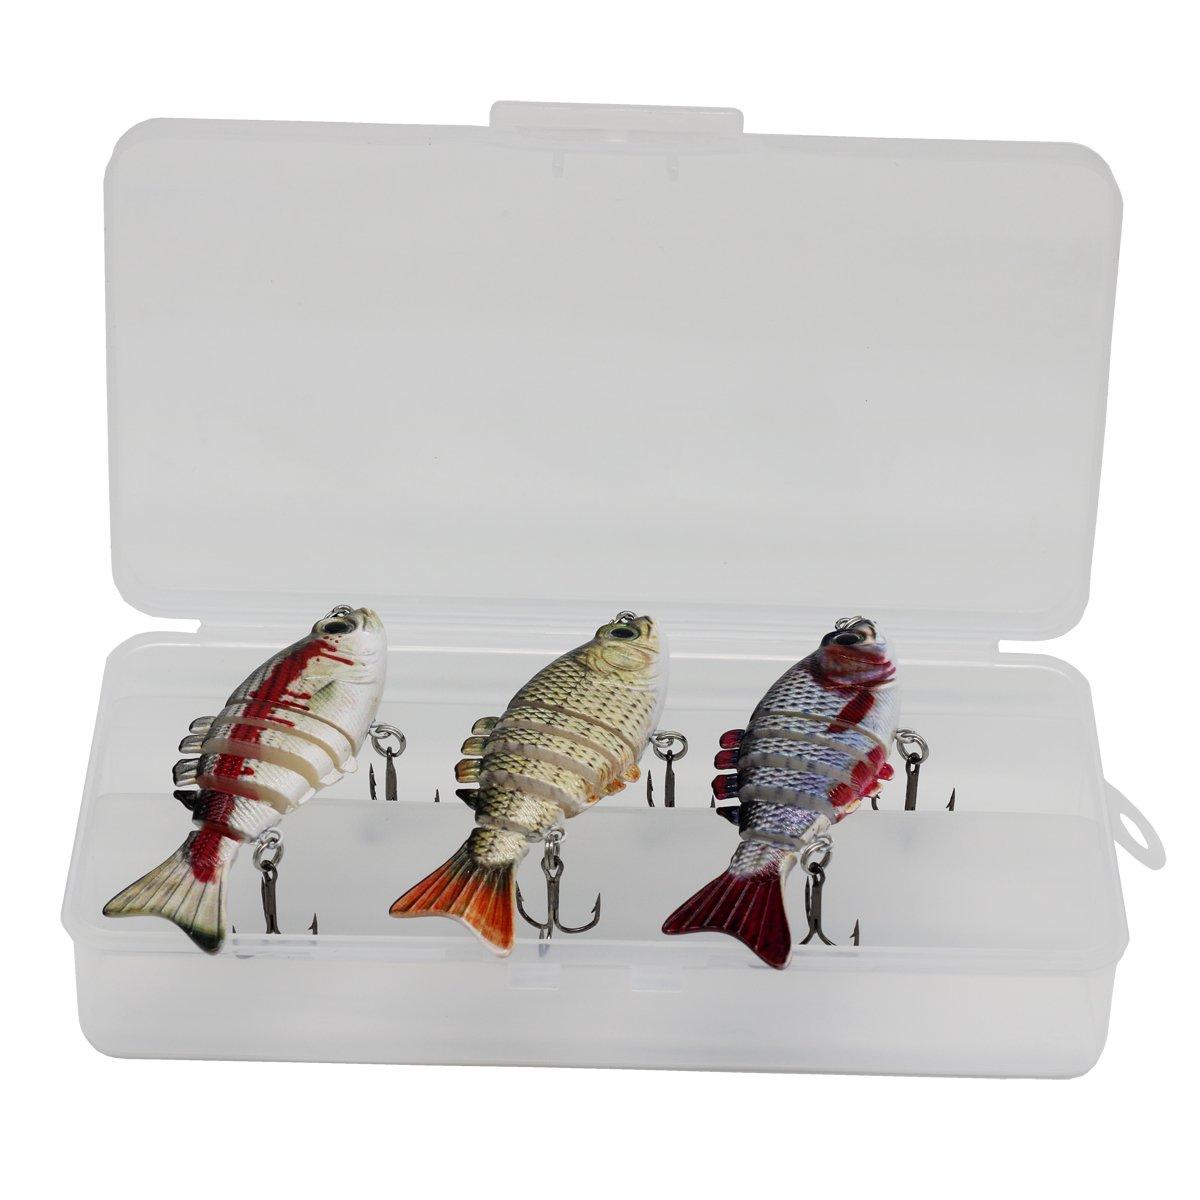 Modenpeak WP-6S3P Multi Jointed Fishing Hard Lure Bait Swimbait Life-Like(3PS)